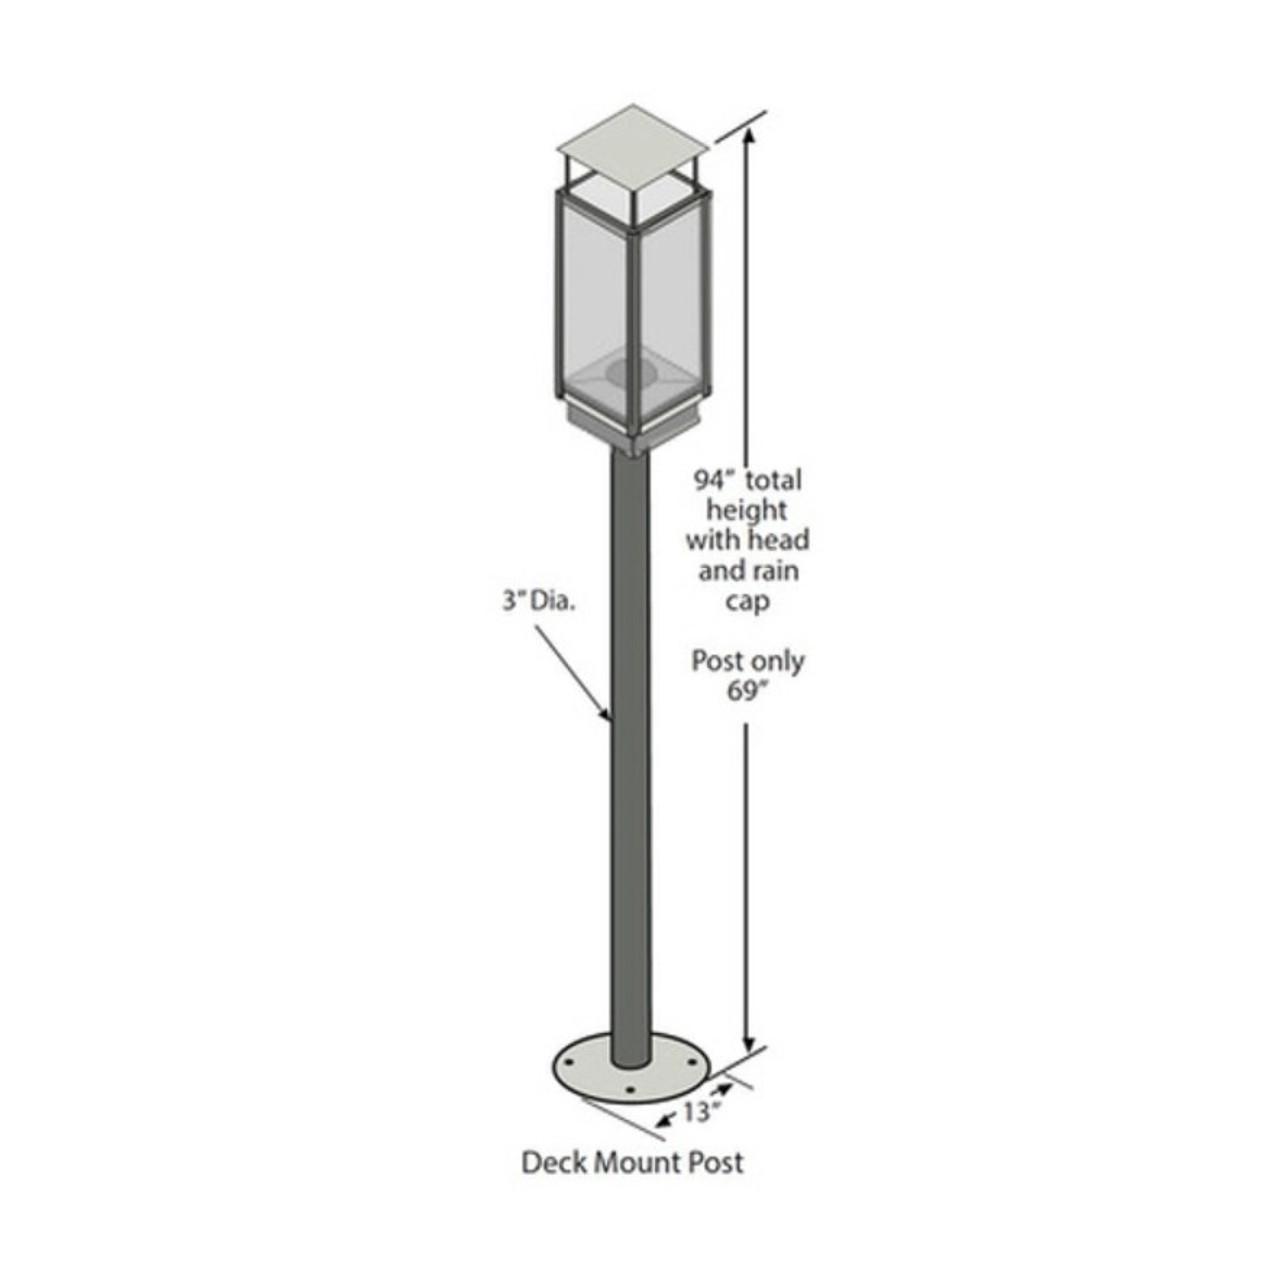 Tempest Torch Deck Post